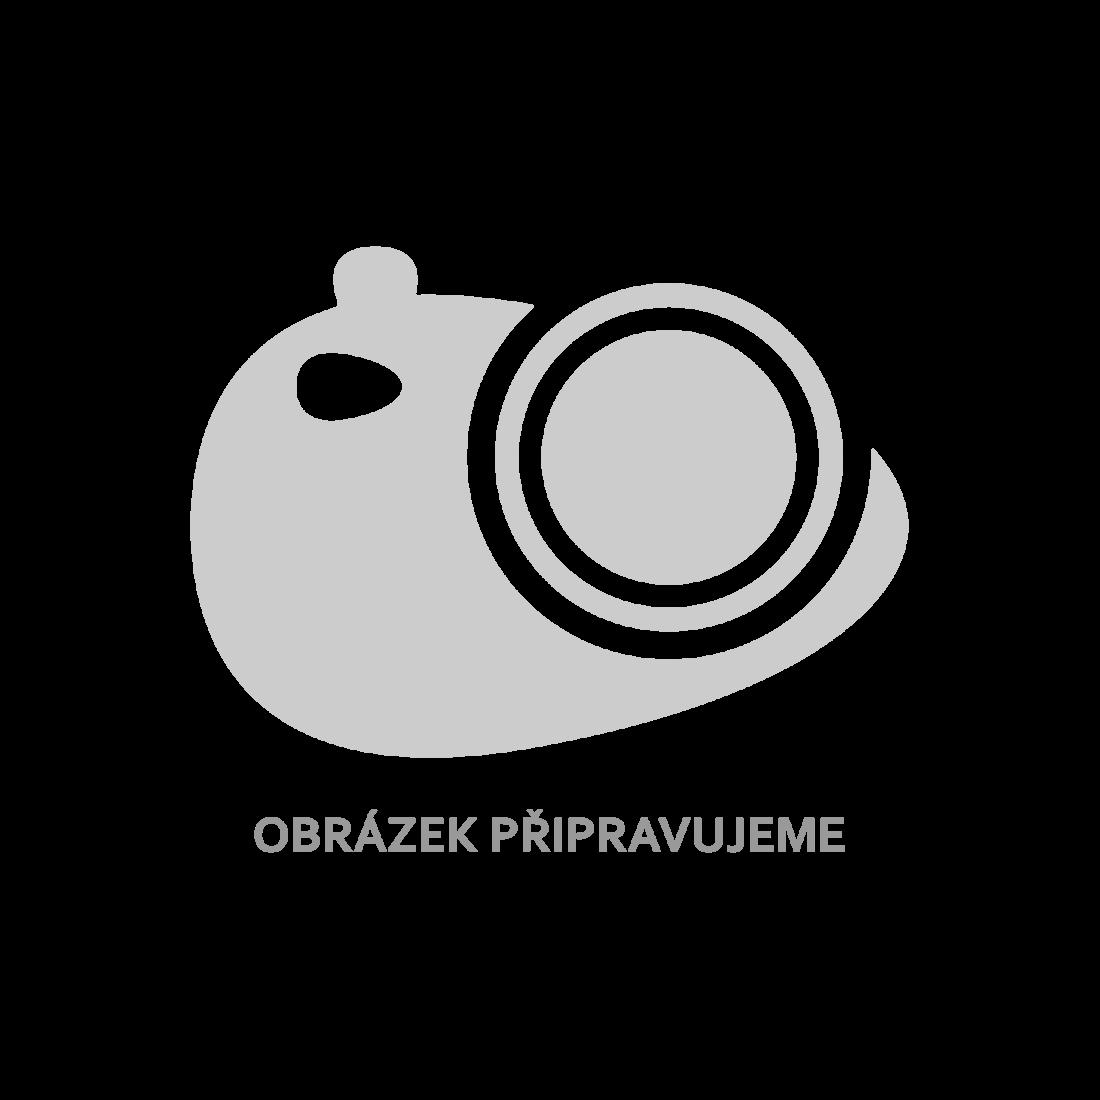 vidaXL Knihovna šedá 40 x 35 x 180 cm dřevotříska [803400]